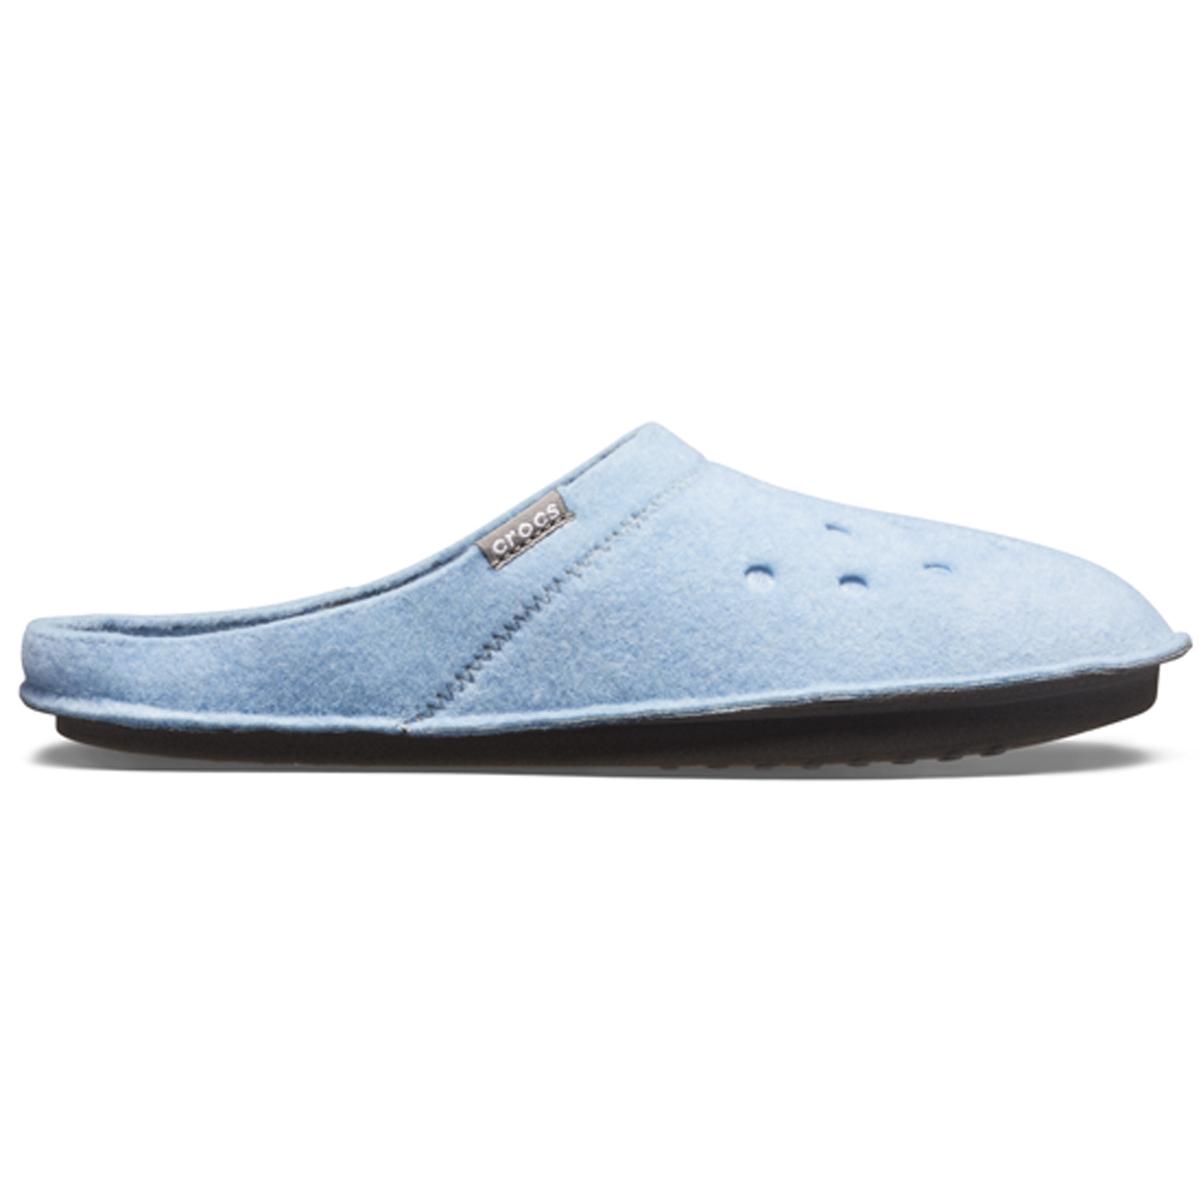 Classic Slipper - Patiska Mavi/Barut Rengi